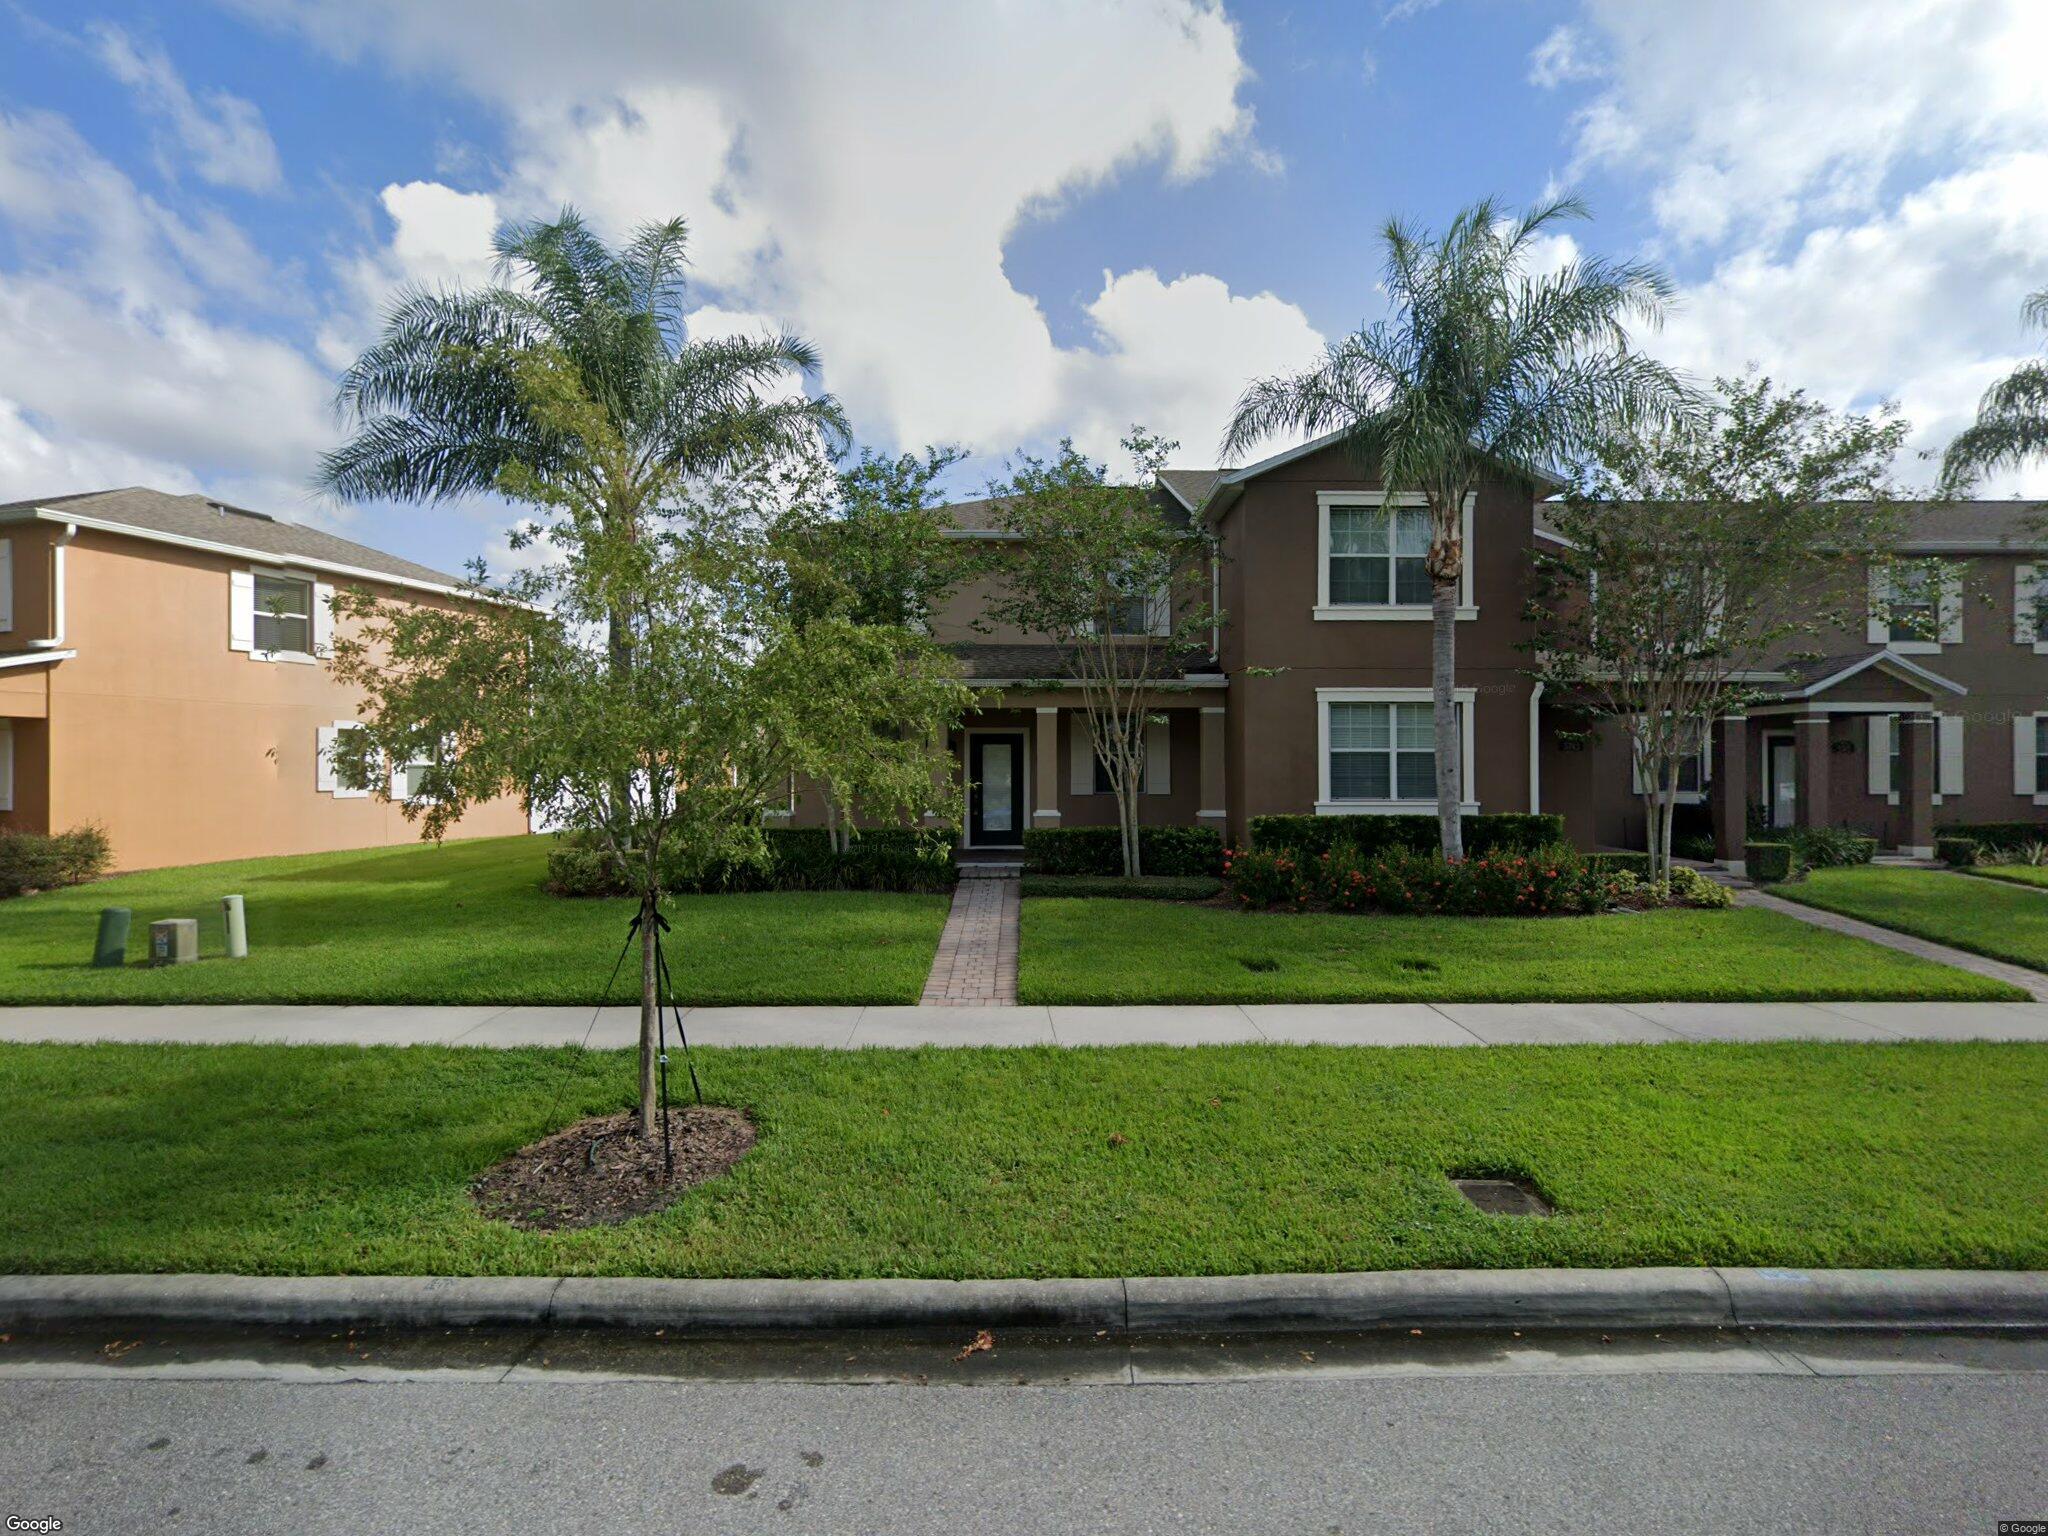 5739 New Independence Pkwy, Winter Garden, FL 34787 - Foreclosure ...